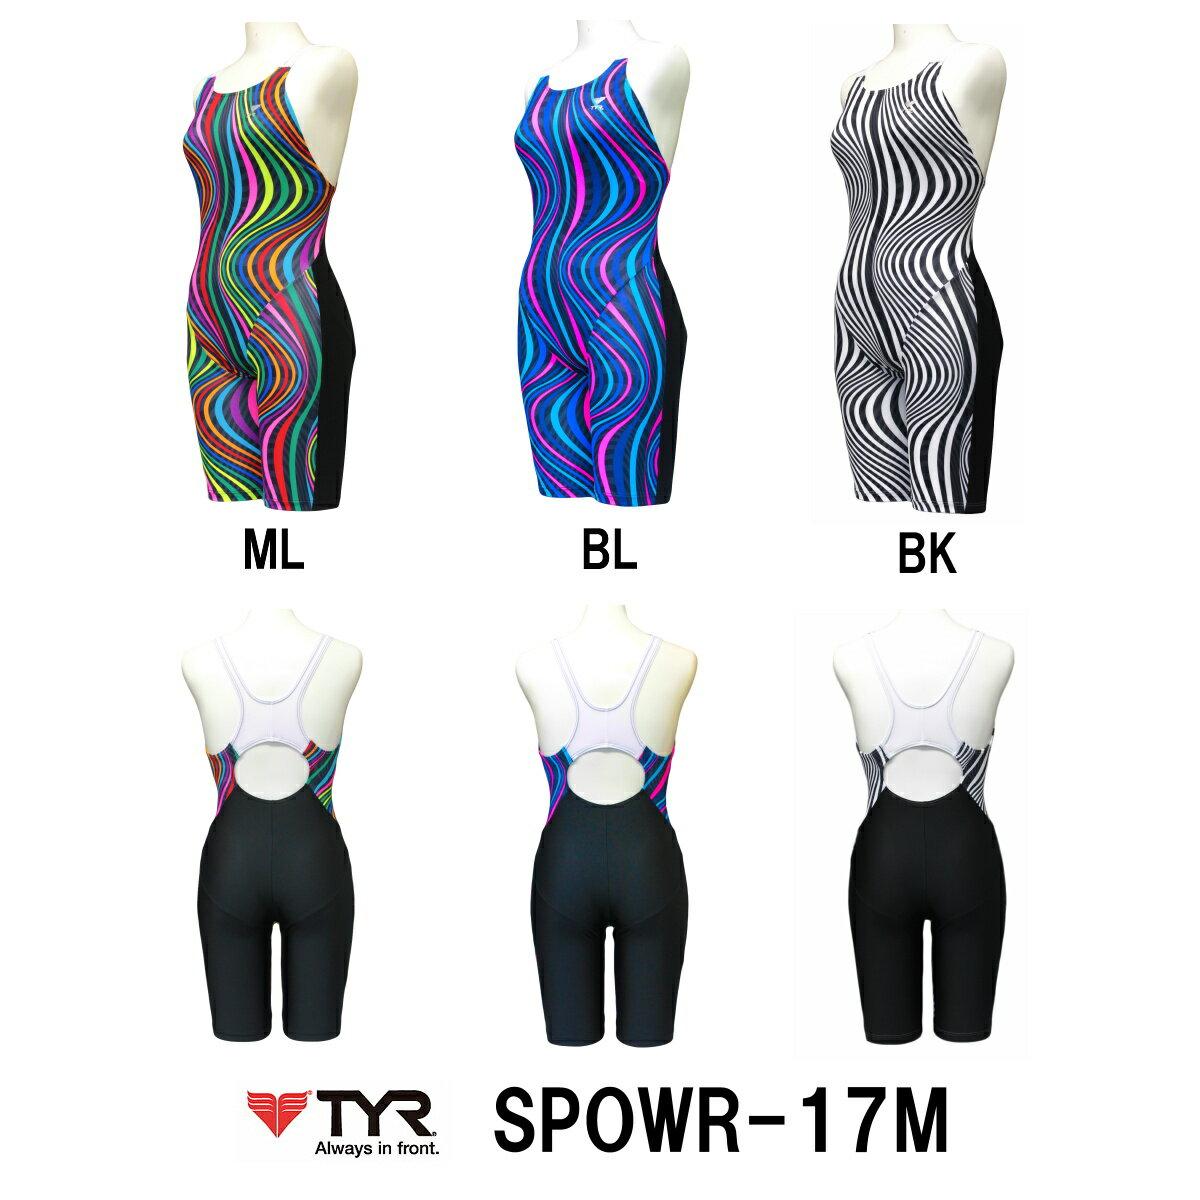 【SPOWR-17M】TYR(ティア) レディーストレーニング水着 POWER WATER(パワー ウォーター) ウィメンズオールインワン【POWER TRAINING LINE】[練習用水着/スパッツ/女性用]